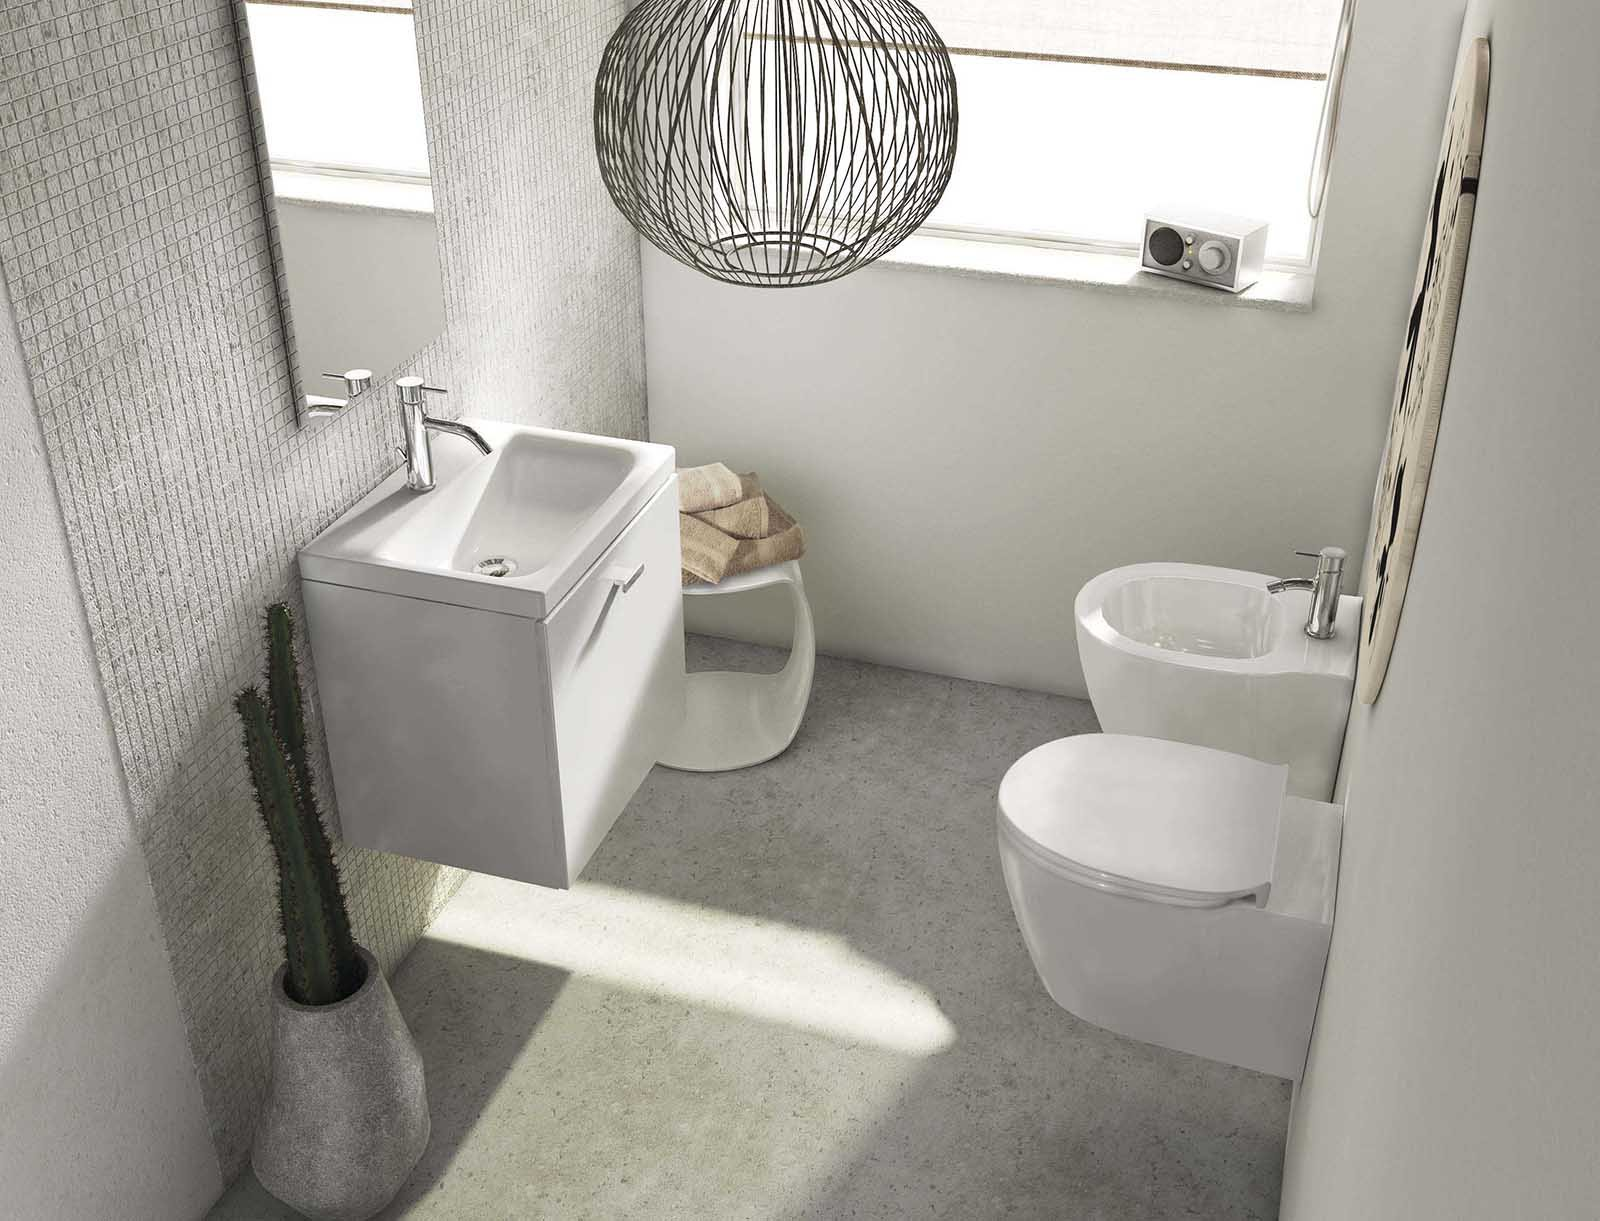 Sanitari salvaspazio poco profondi cose di casa - Ingombro sanitari bagno ...